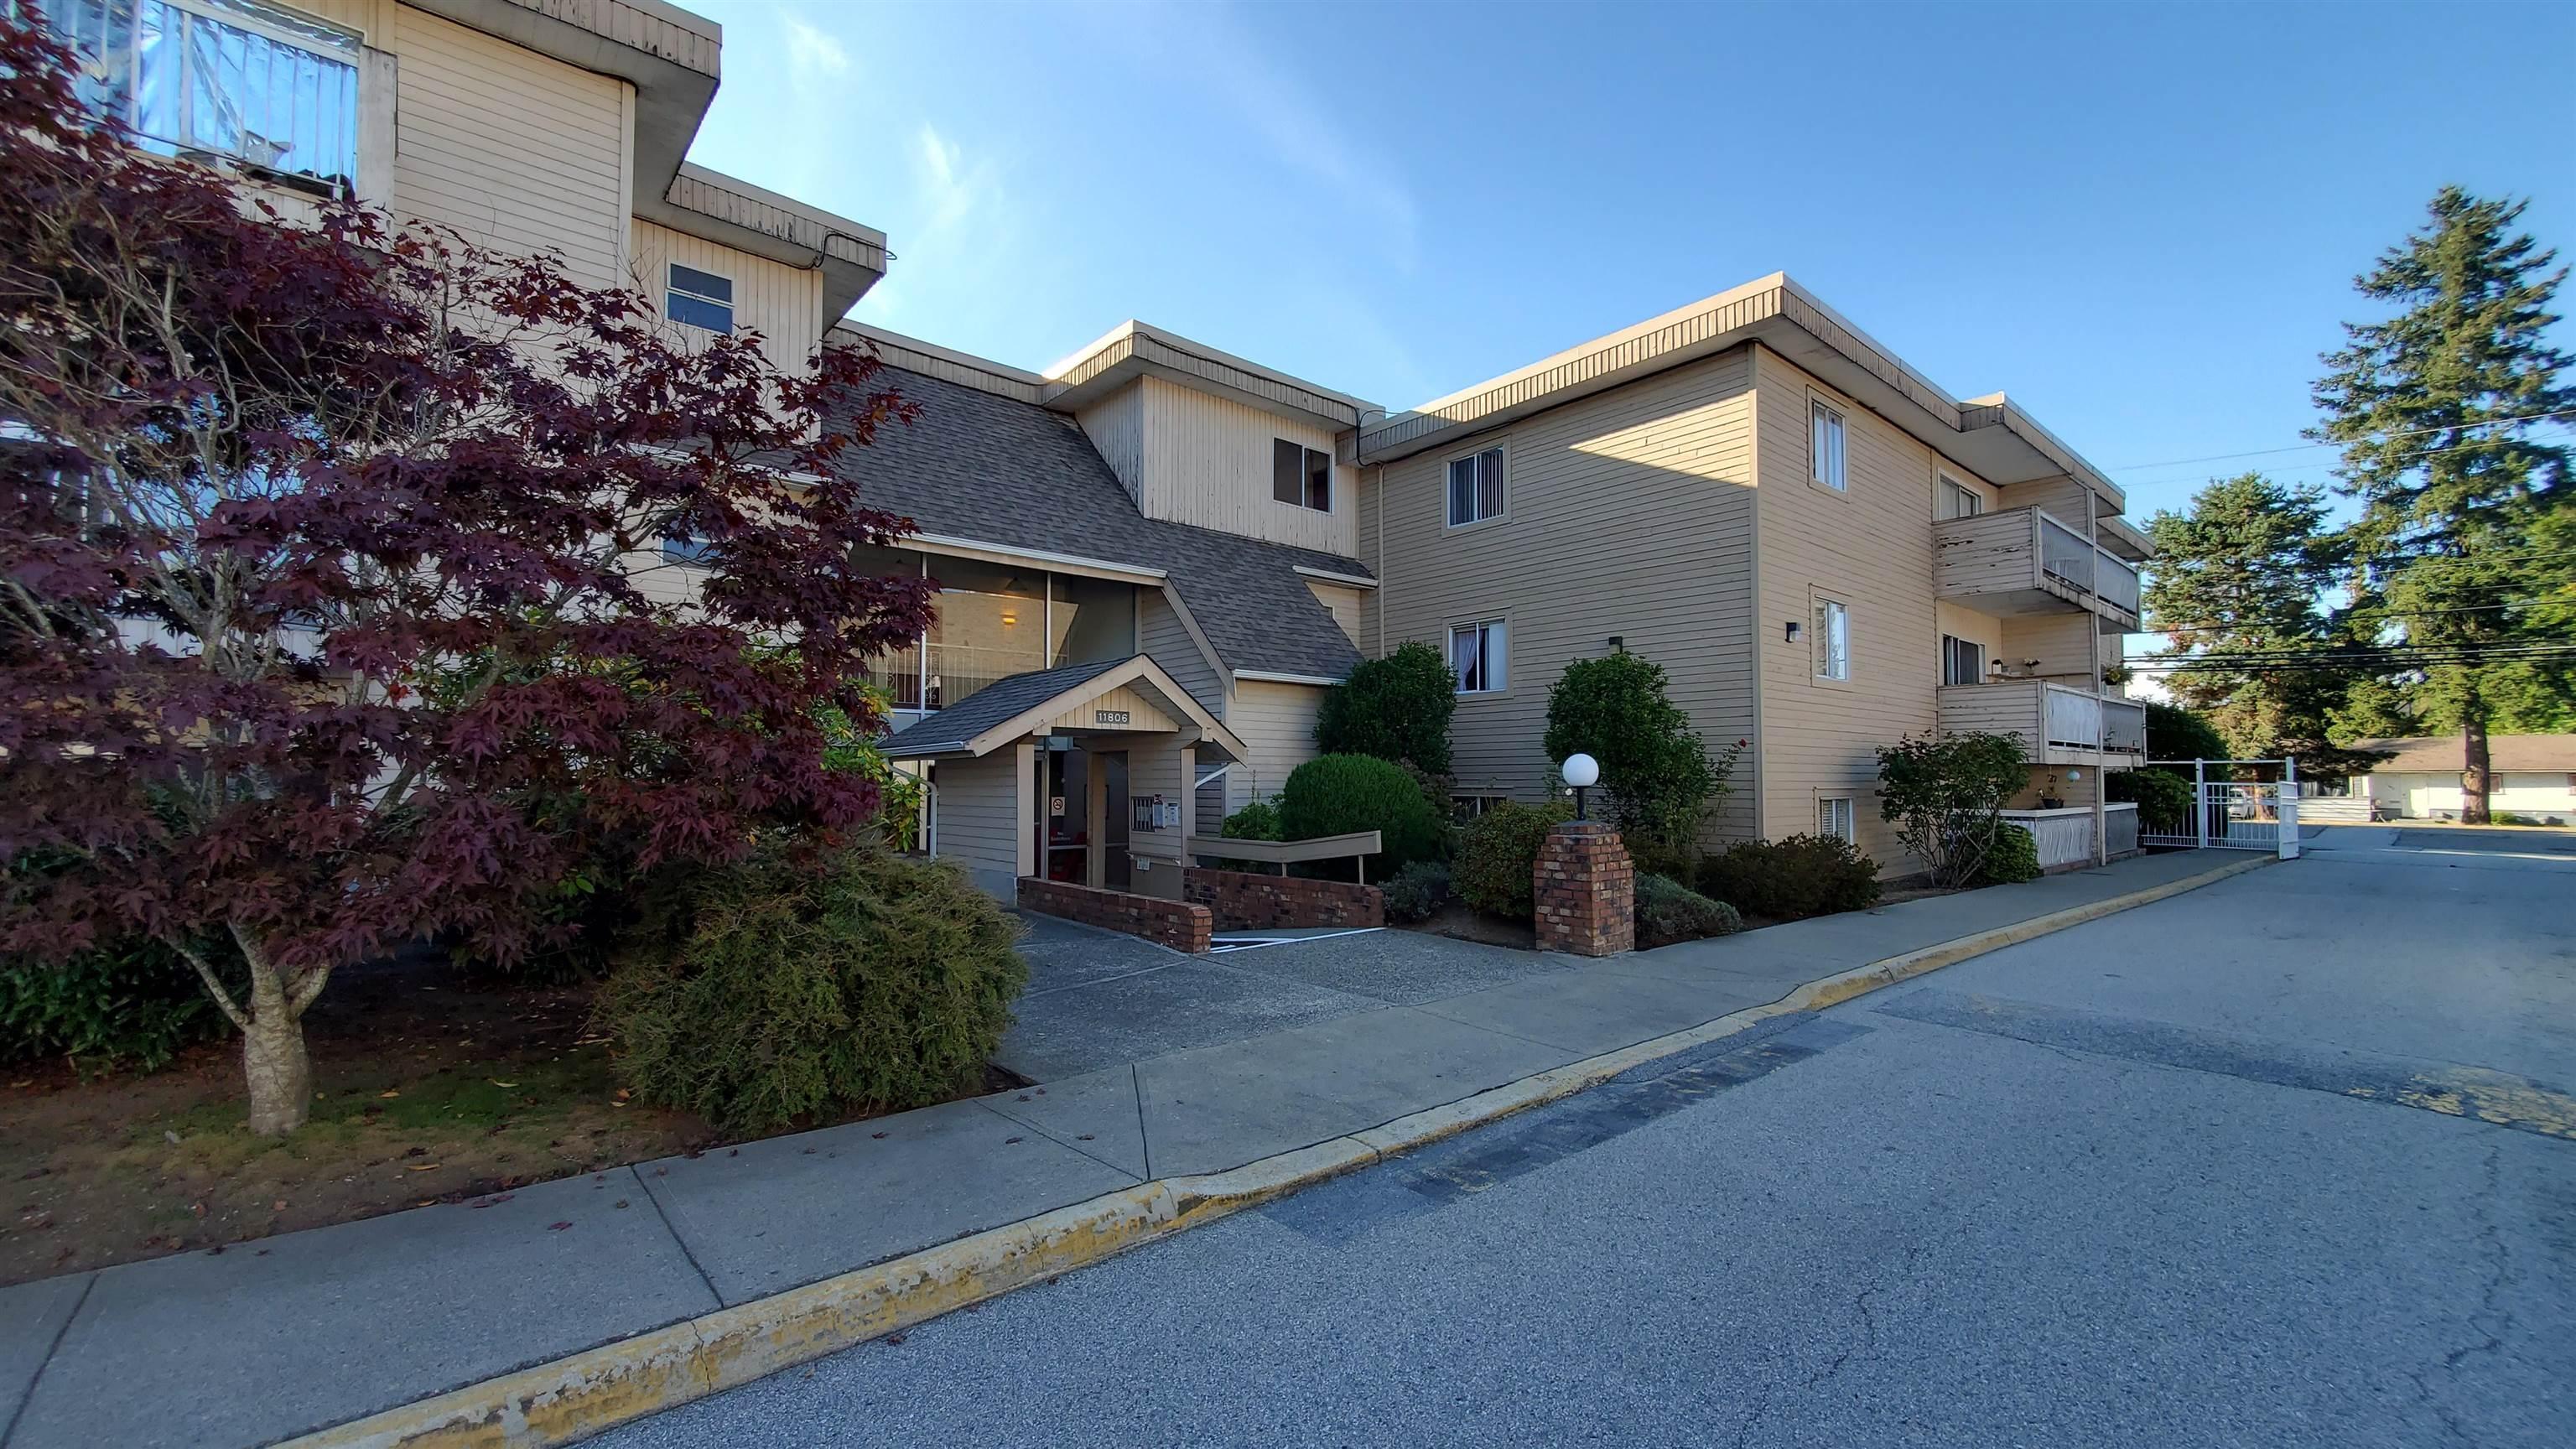 120 11806 88 AVENUE - Annieville Apartment/Condo for sale, 2 Bedrooms (R2616862) - #2